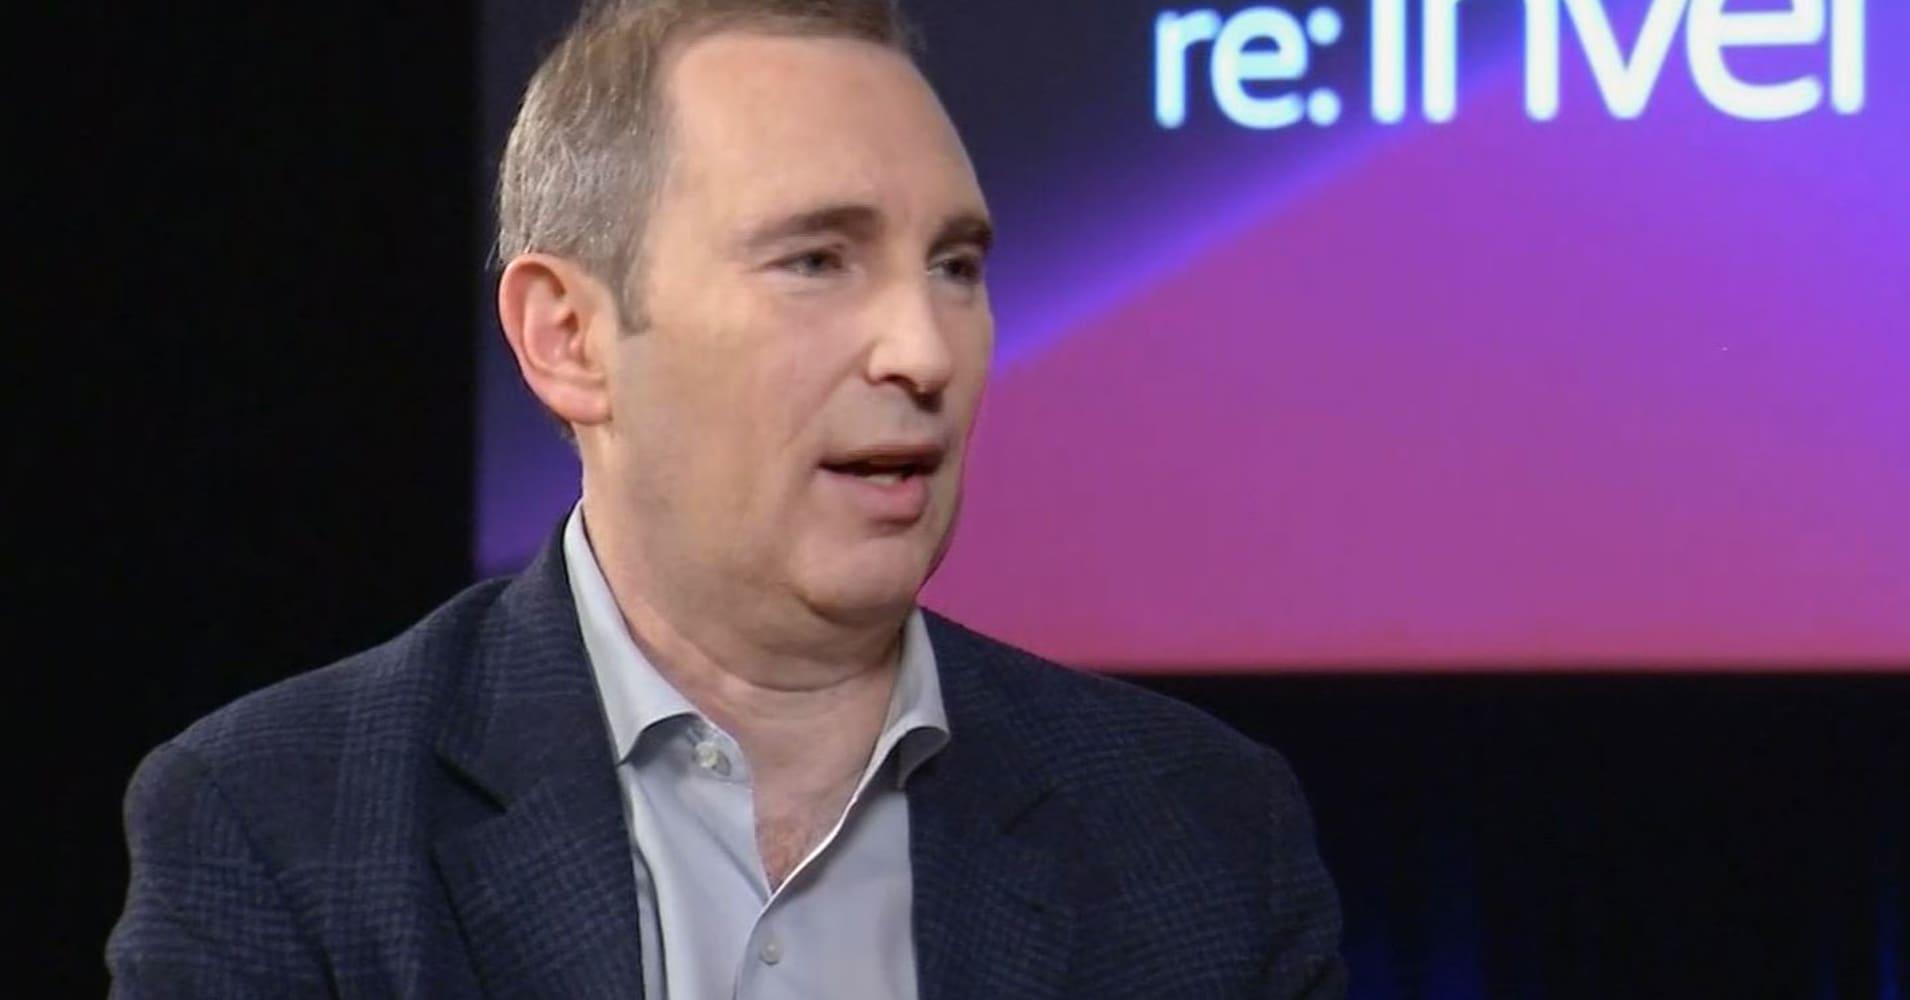 Amazon's Cloud Unit Follows Google into the A.I. Chip Market